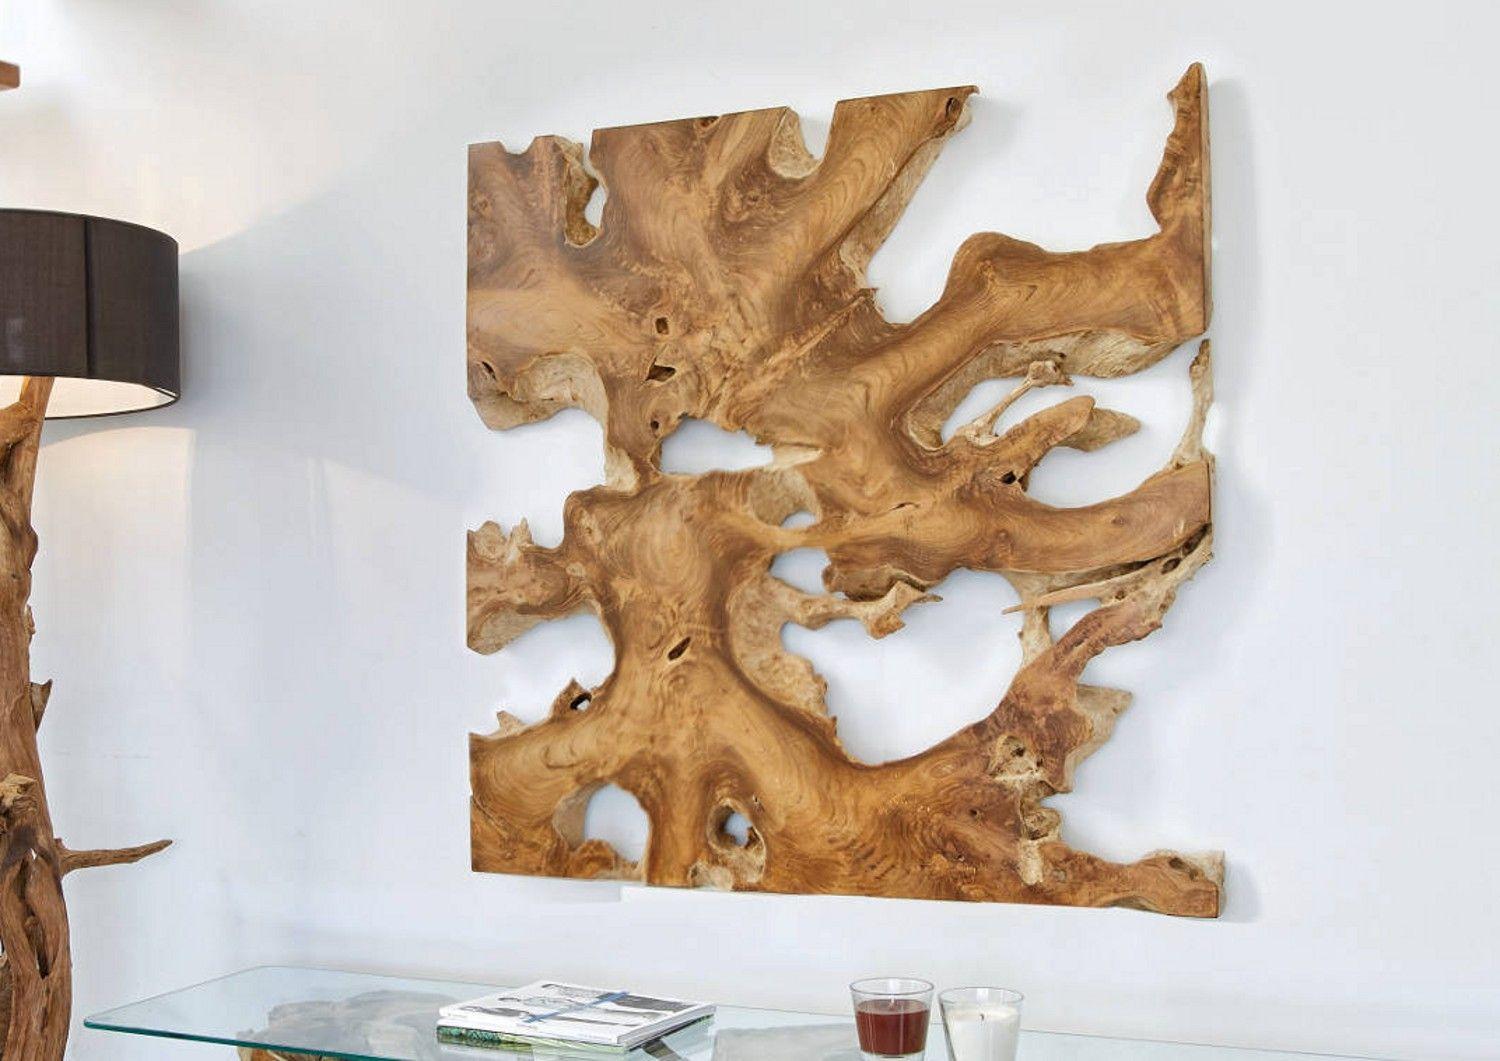 teakholz wandbild wanddekoration teak wurzelholz deko holz teak holz und wurzelholz. Black Bedroom Furniture Sets. Home Design Ideas